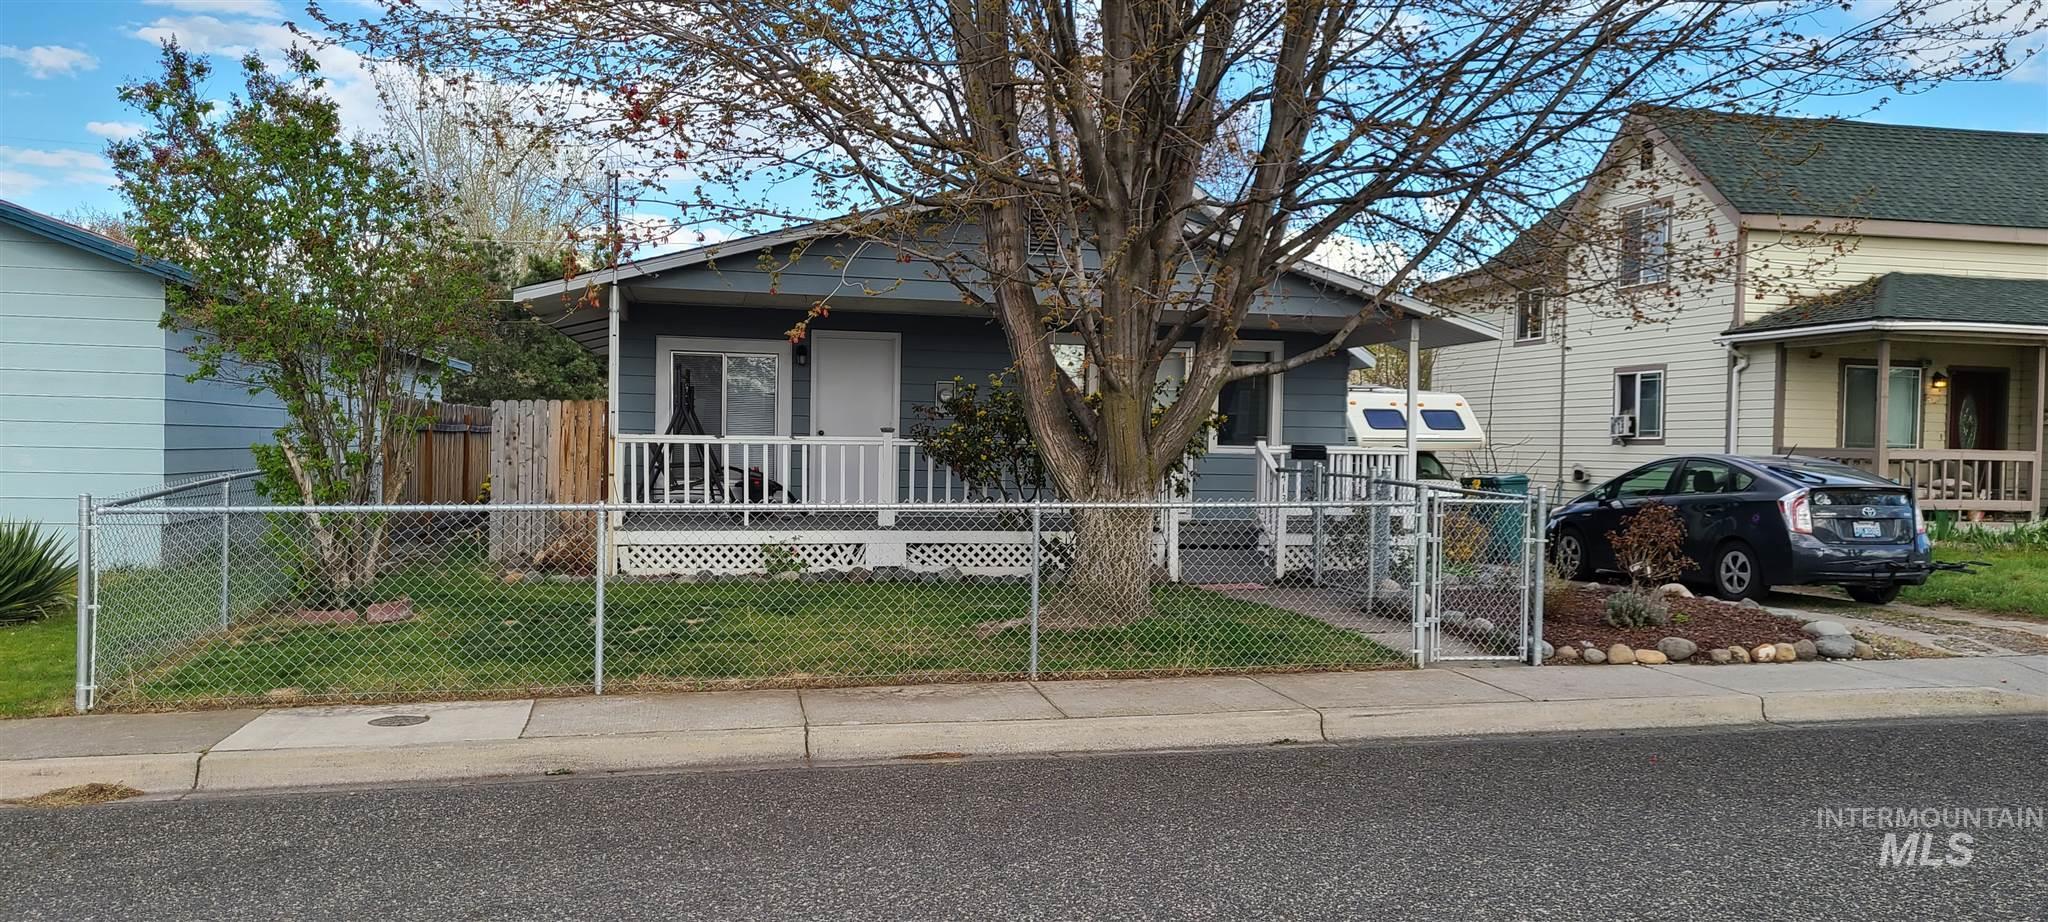 413 7th Street Property Photo - Clarkston, WA real estate listing